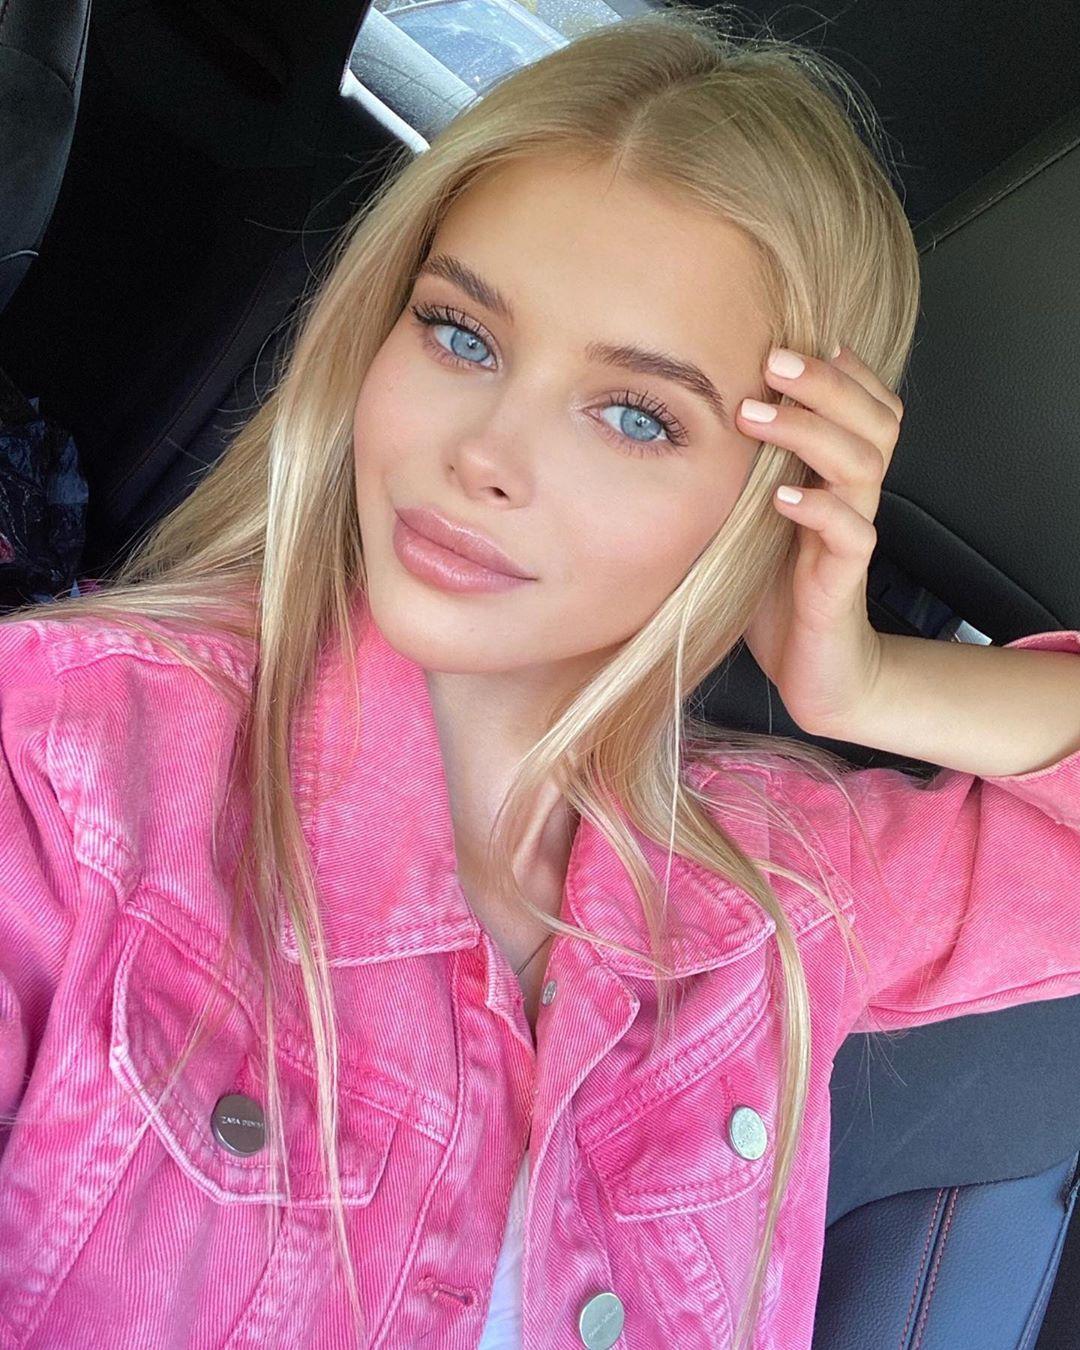 Alla Bruletova On Instagram Fashion Women Red Leather Jacket